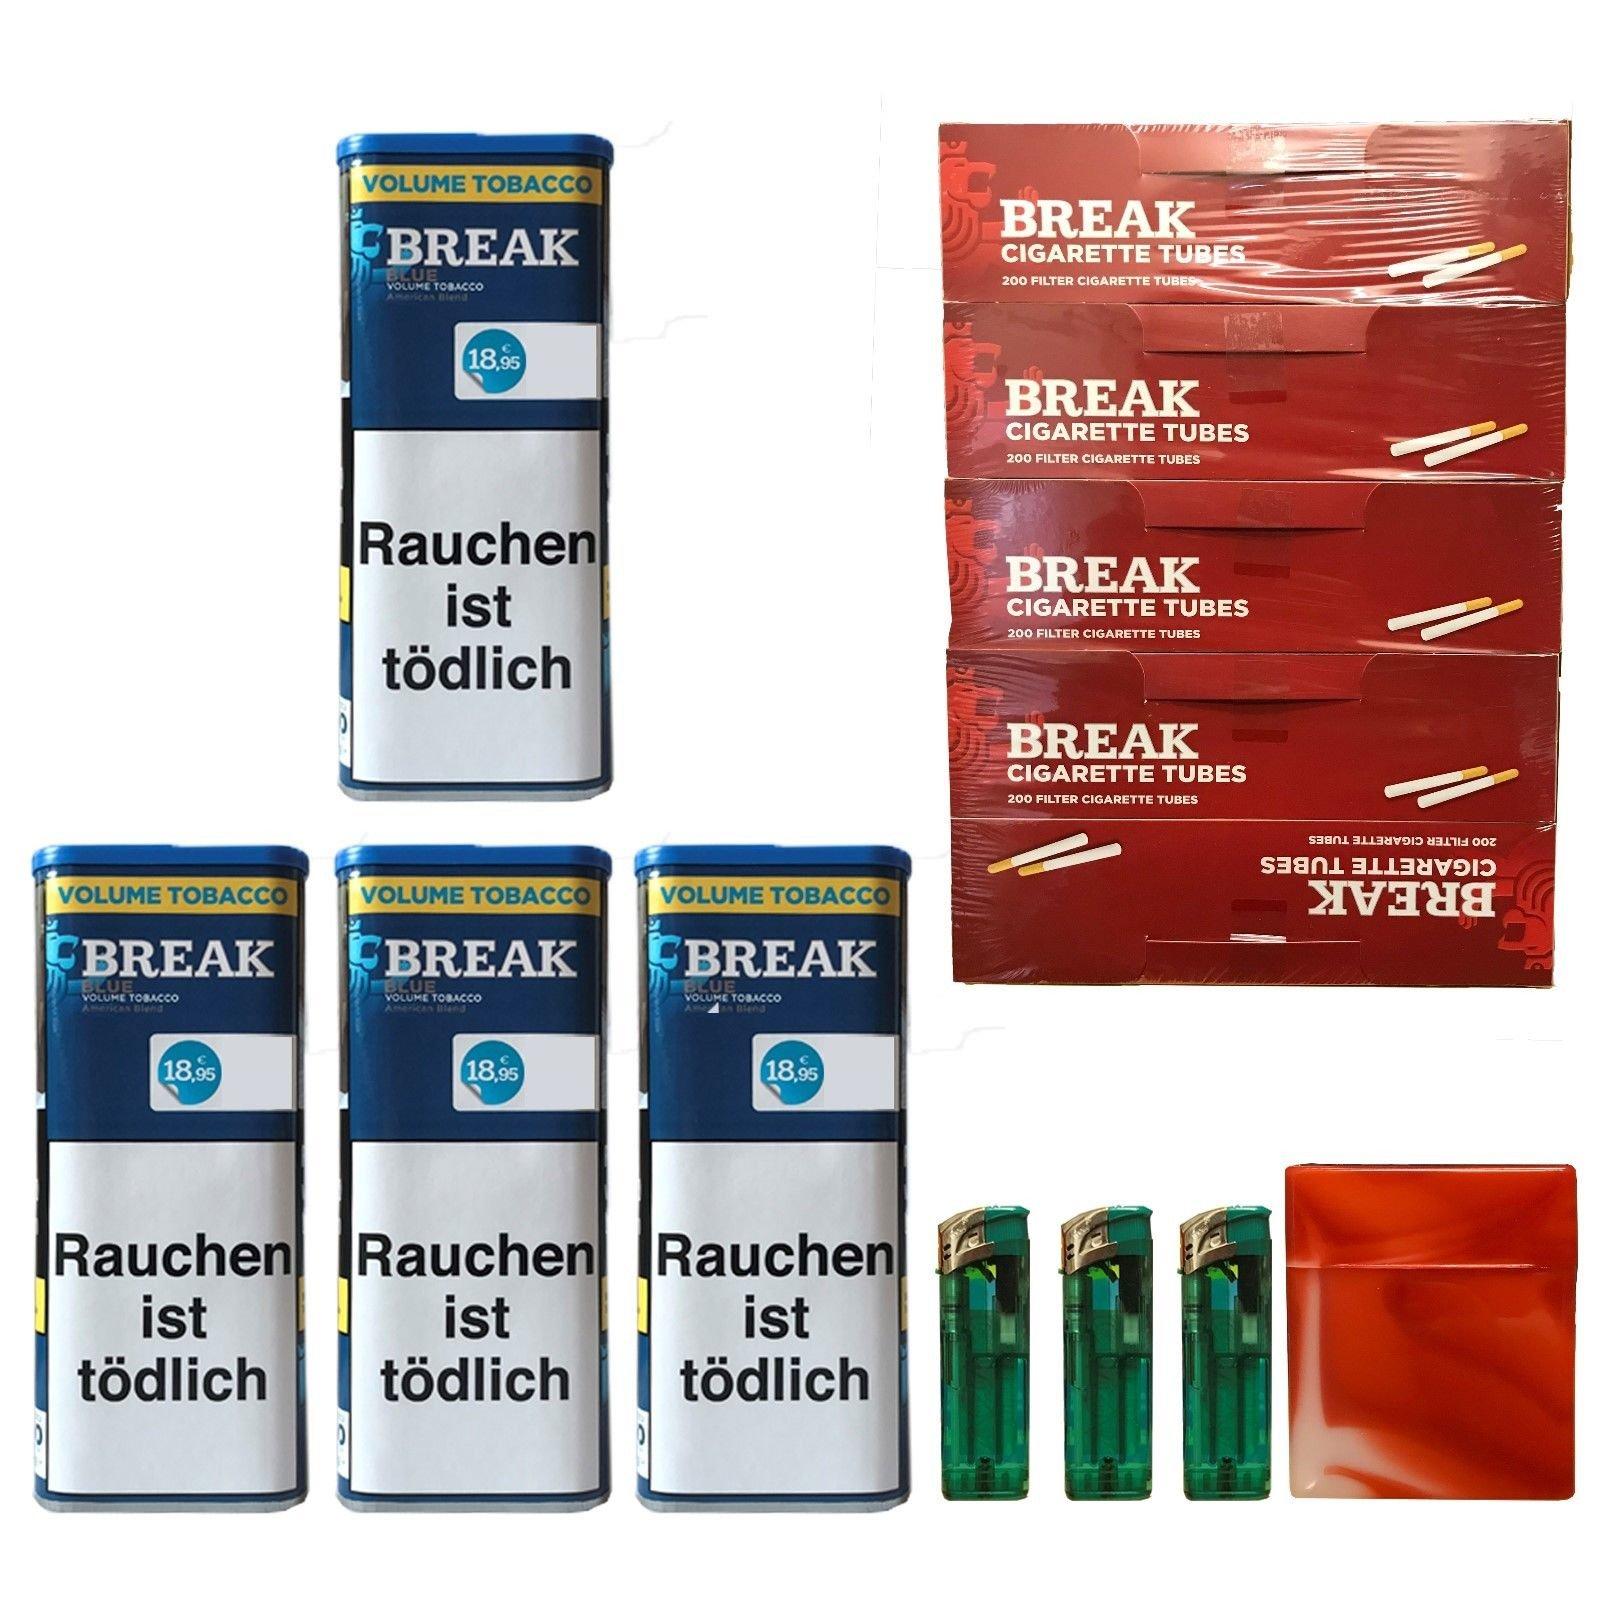 4x Break Blue/Blau XXL Volumentabak 120g, Hülsen, 3 Feuerzeuge, Box